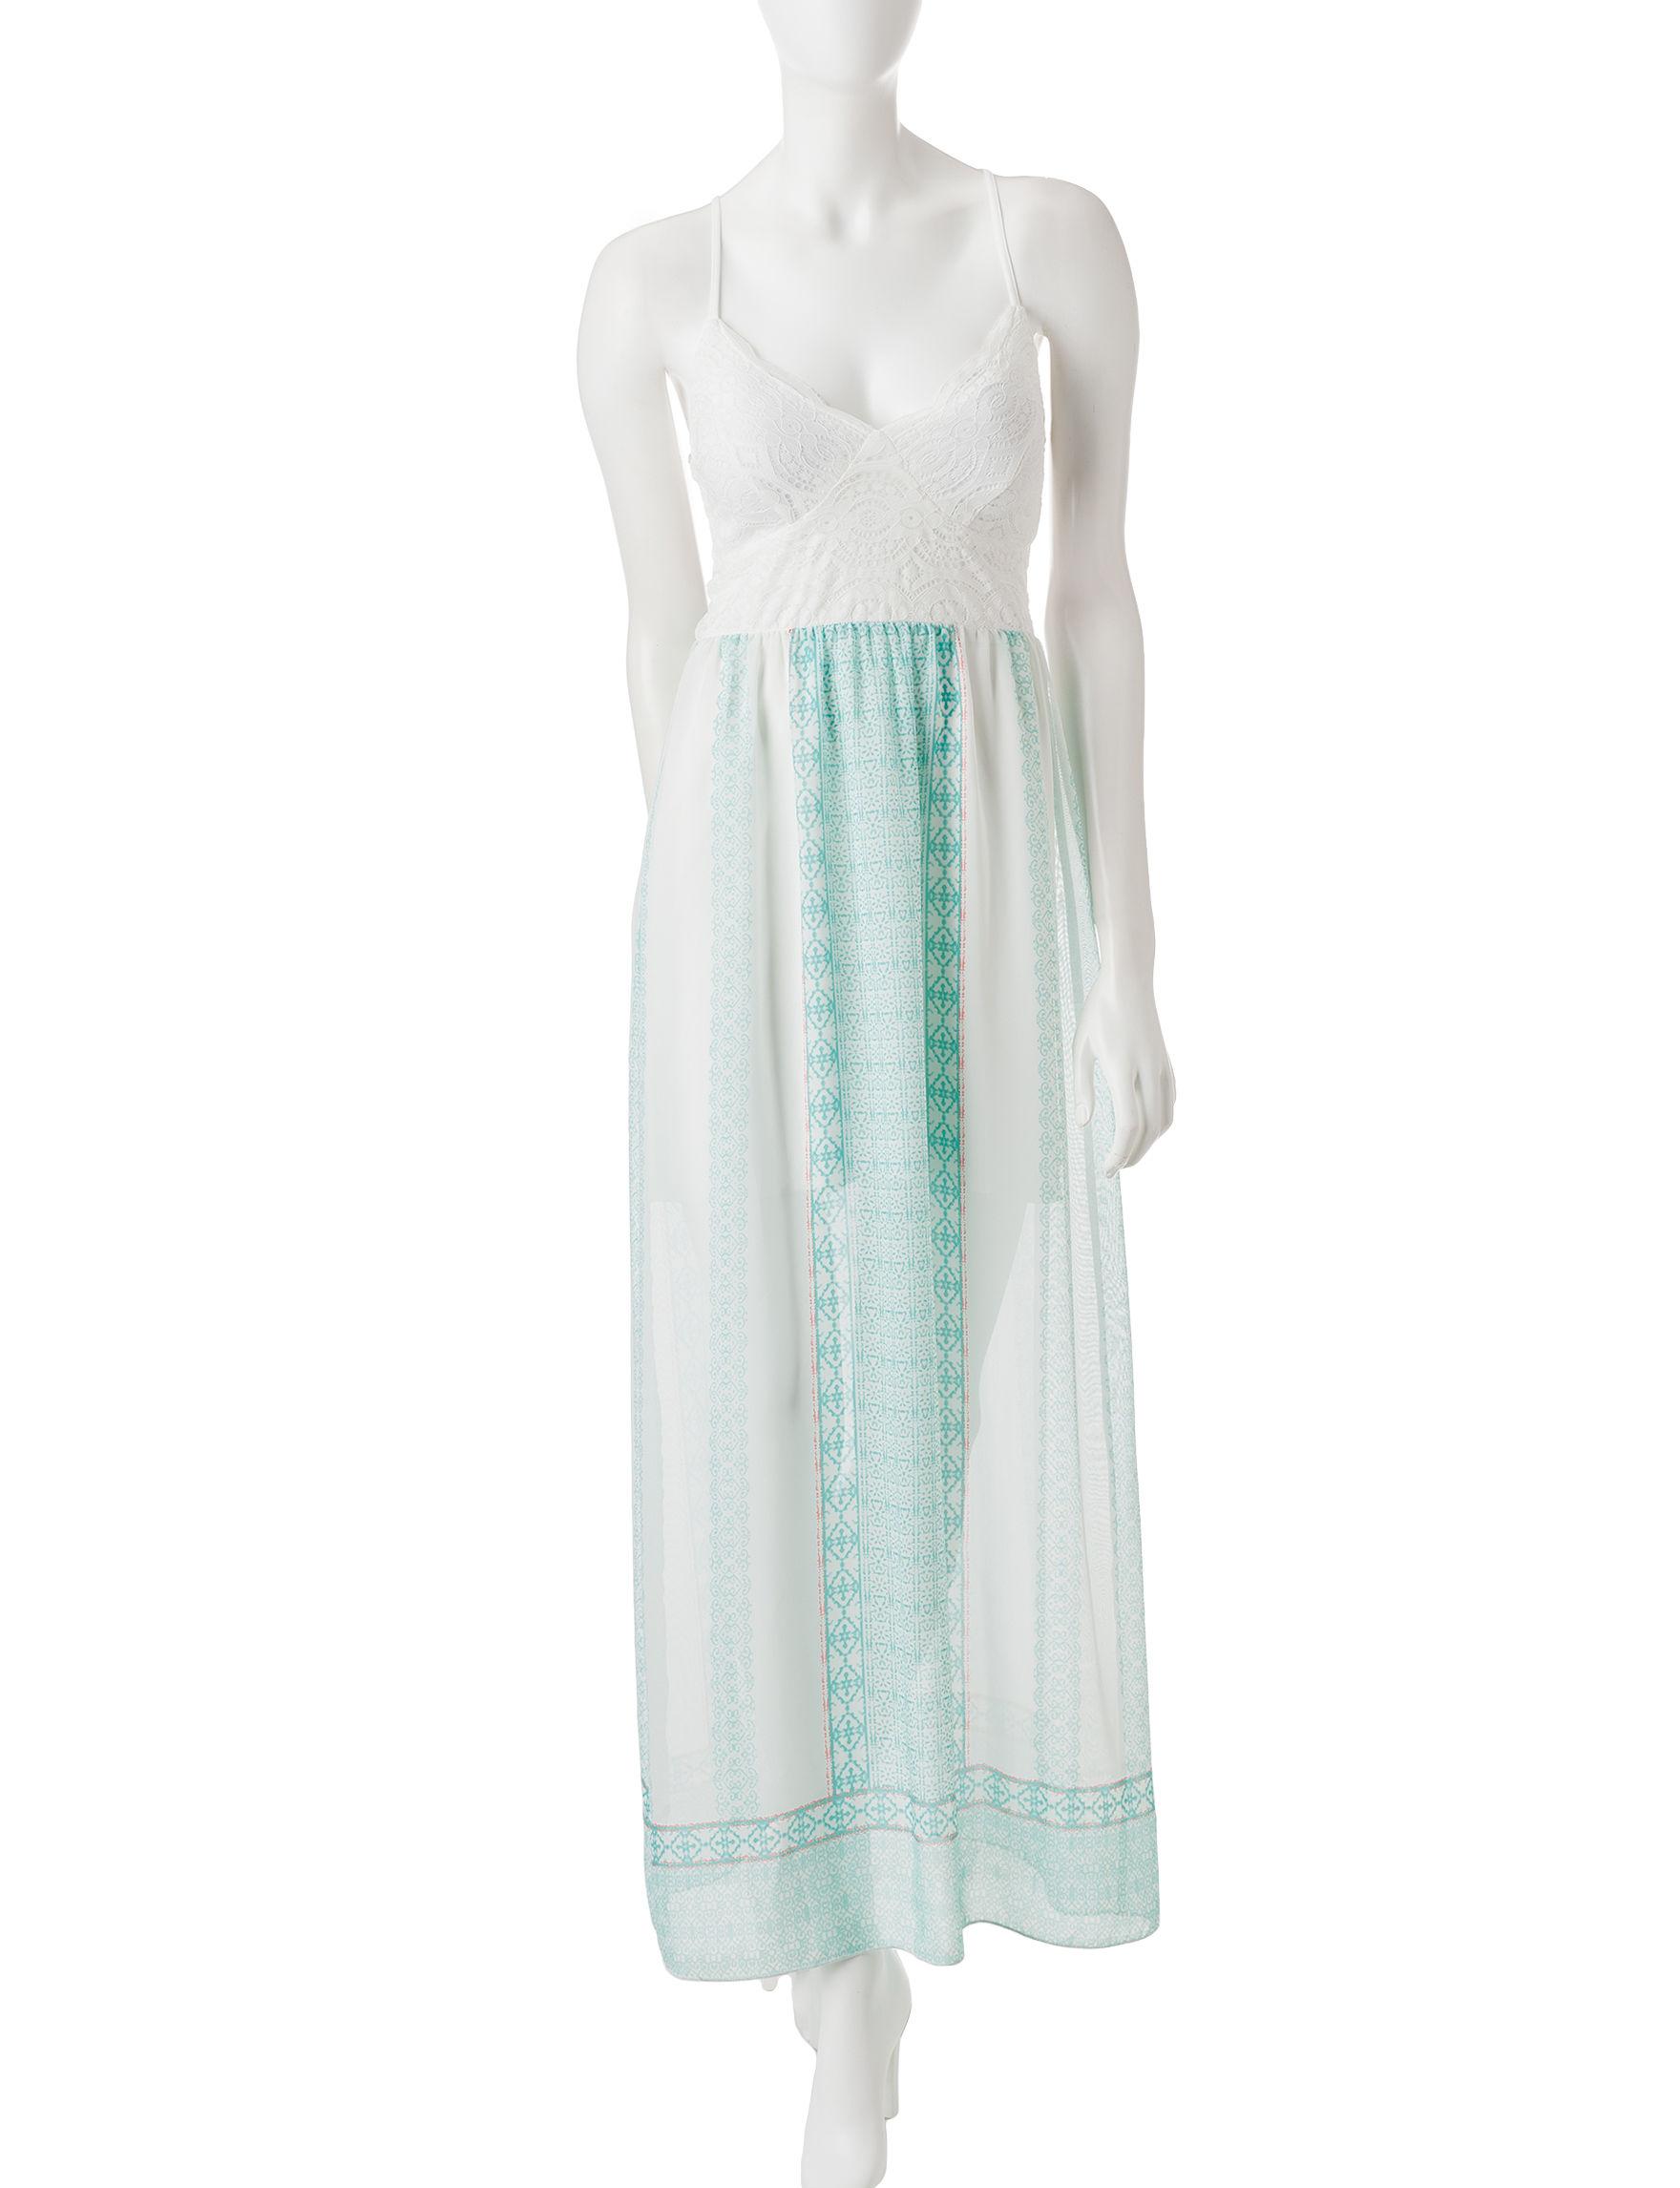 Trixxi White / Blue Everyday & Casual Sundresses